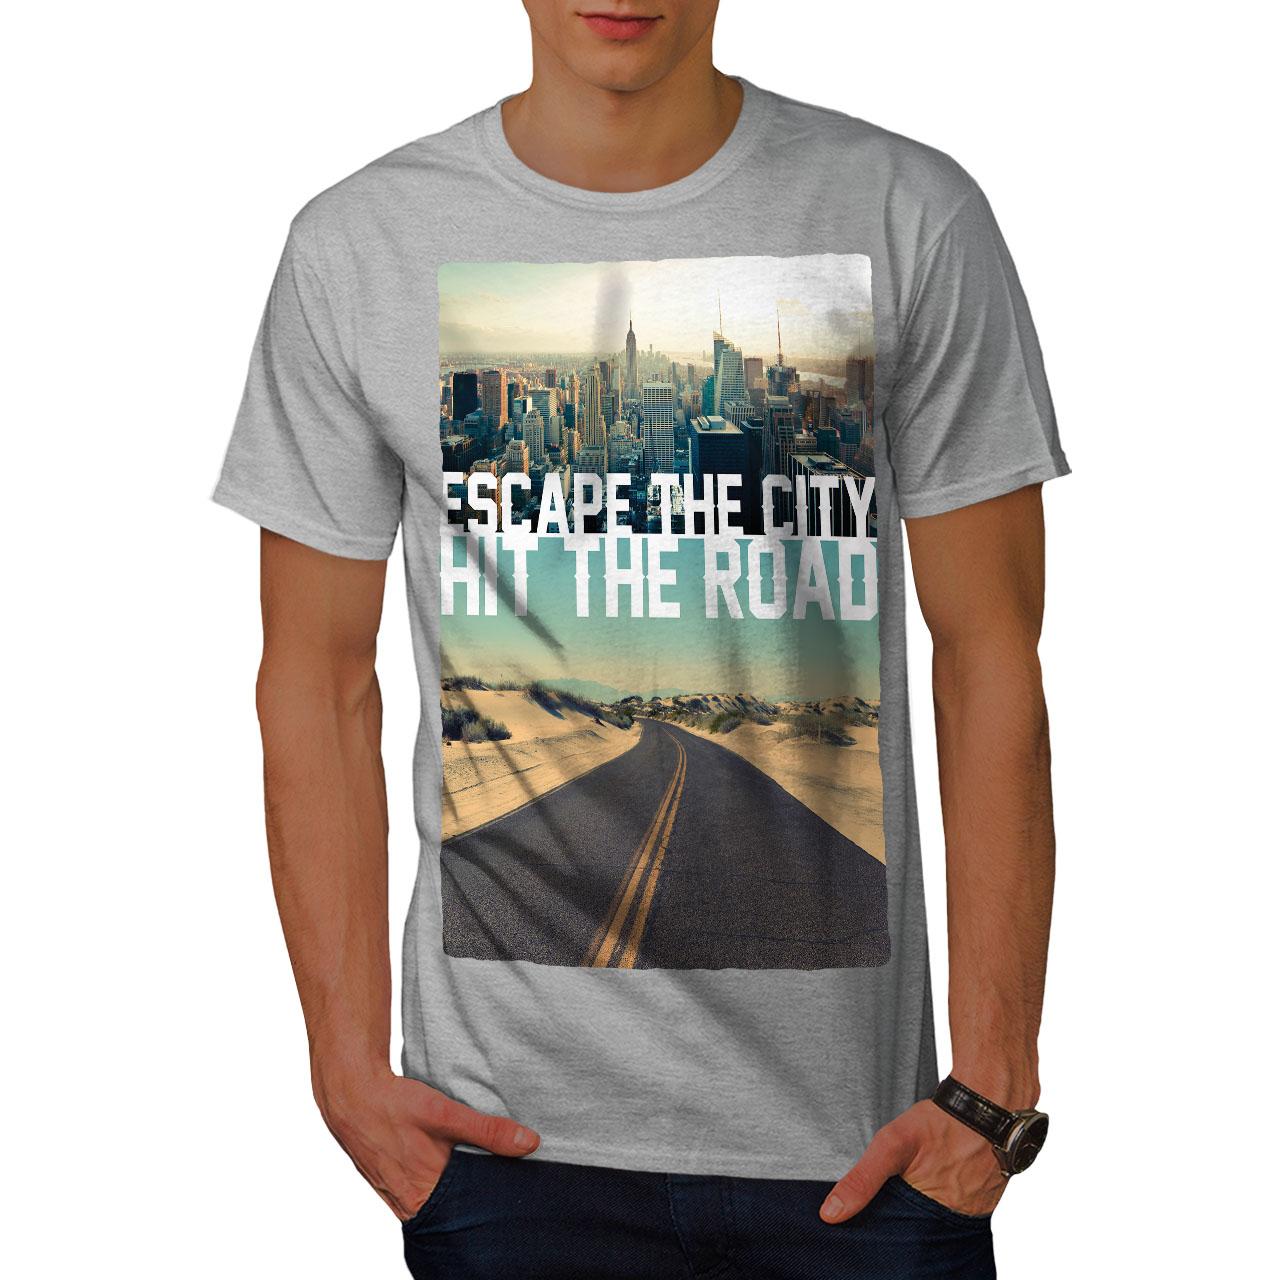 Wellcoda-Escape-The-City-Herren-T-Shirt-Lifestyle-Grafikdesign-Printed-Tee Indexbild 15